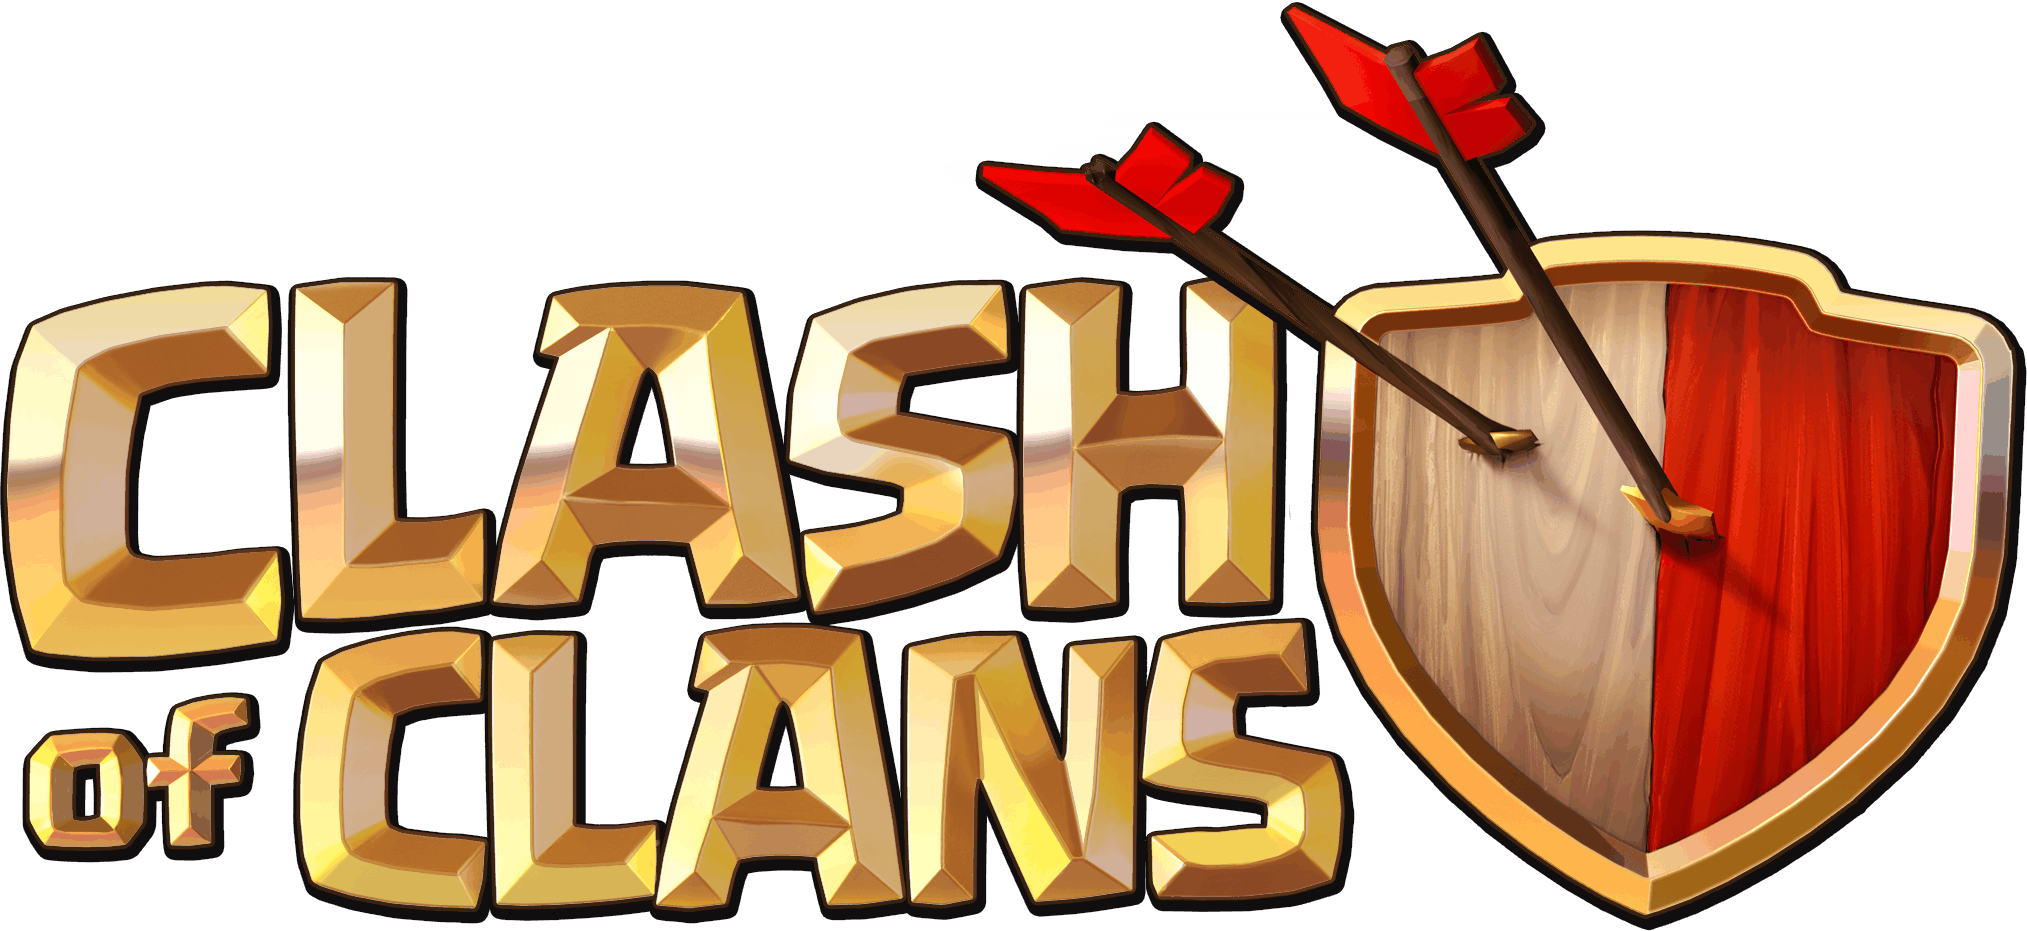 Clash Of Clans Logo transparent PNG - StickPNG